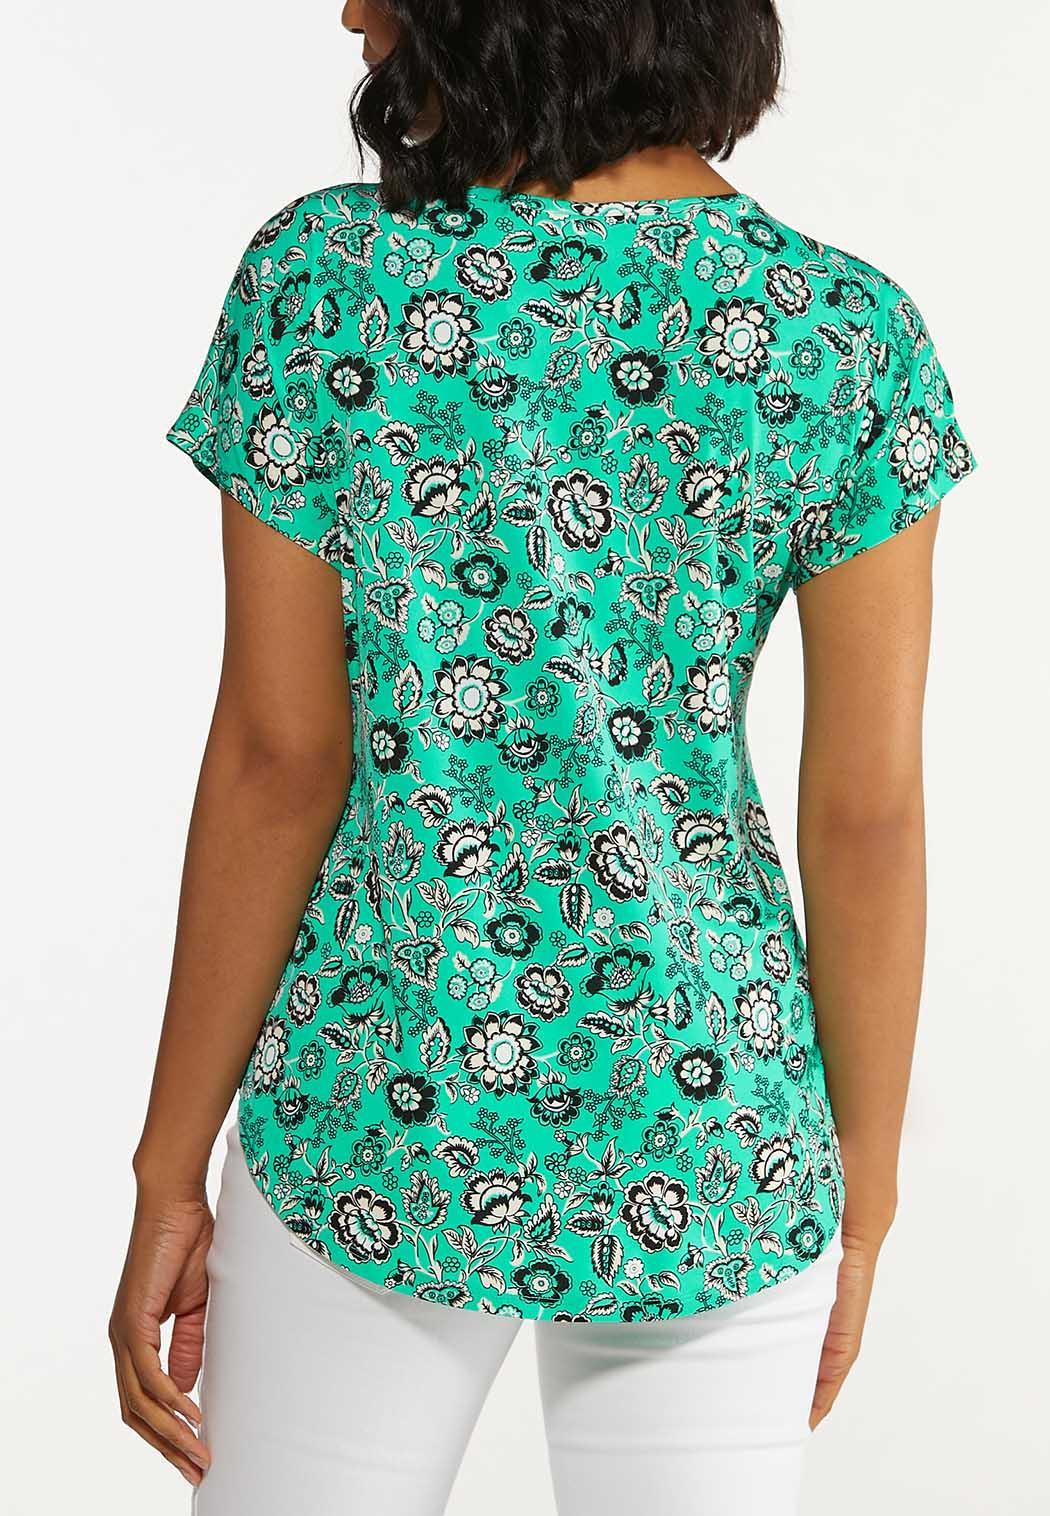 Green Floral Top (Item #44650240)